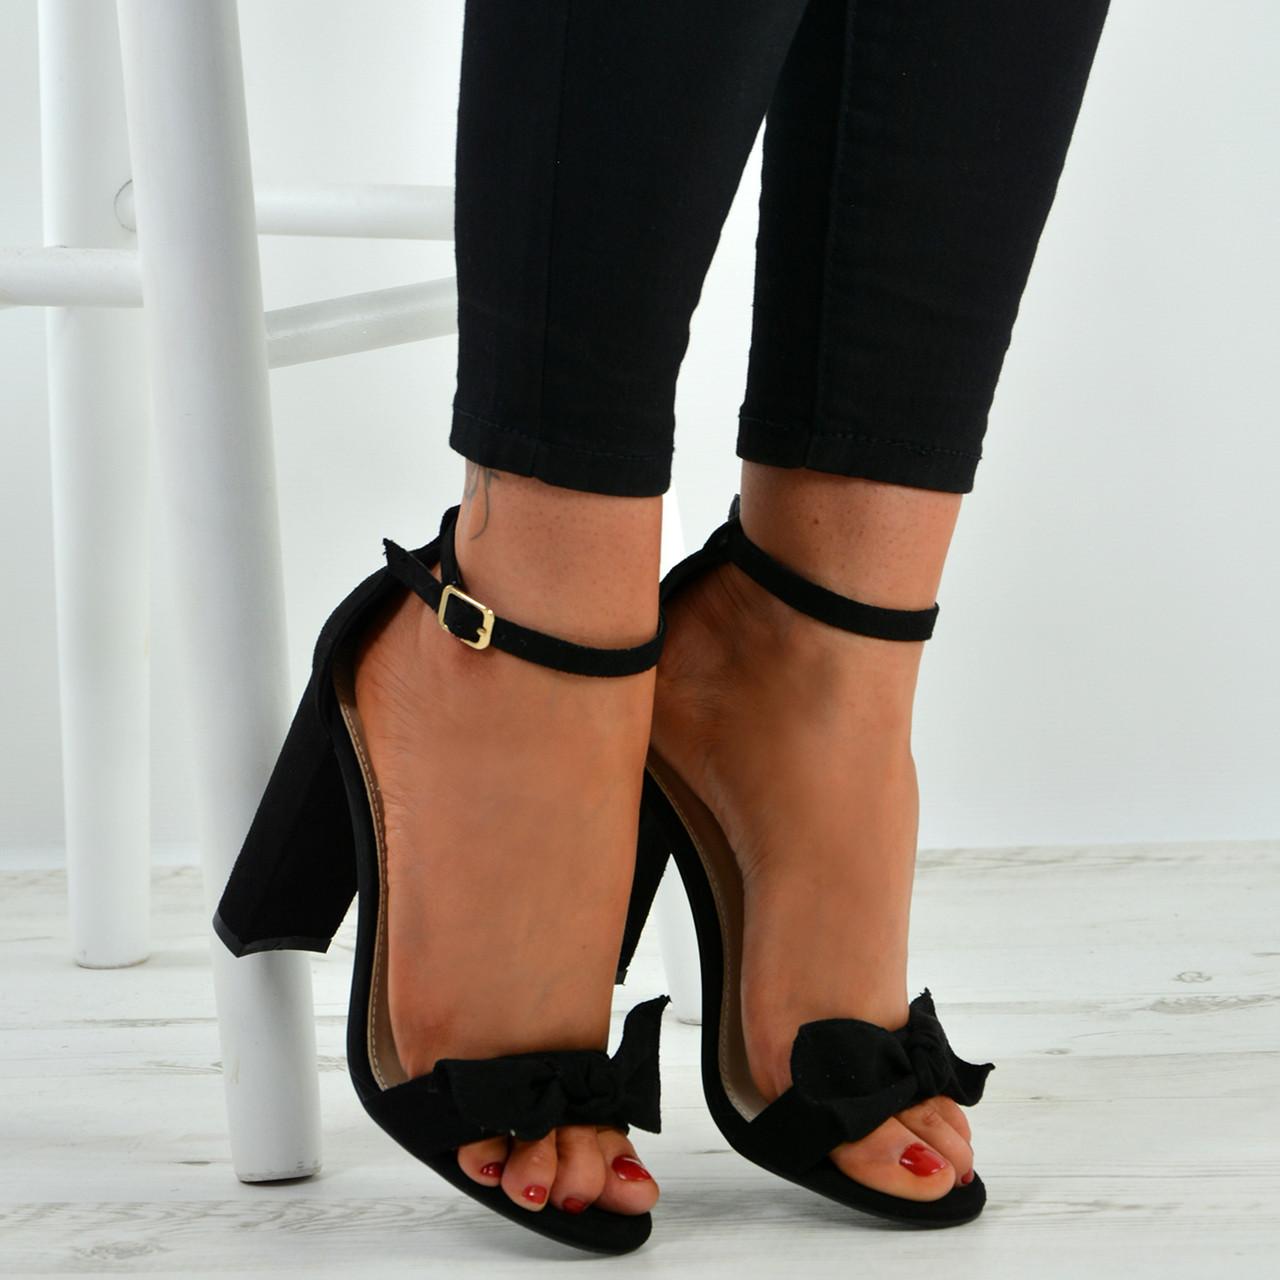 d8e1e6d57b6 New Womens Ladies Bow Sandals Ankle Strap Peep Toe High Block Heels Shoes